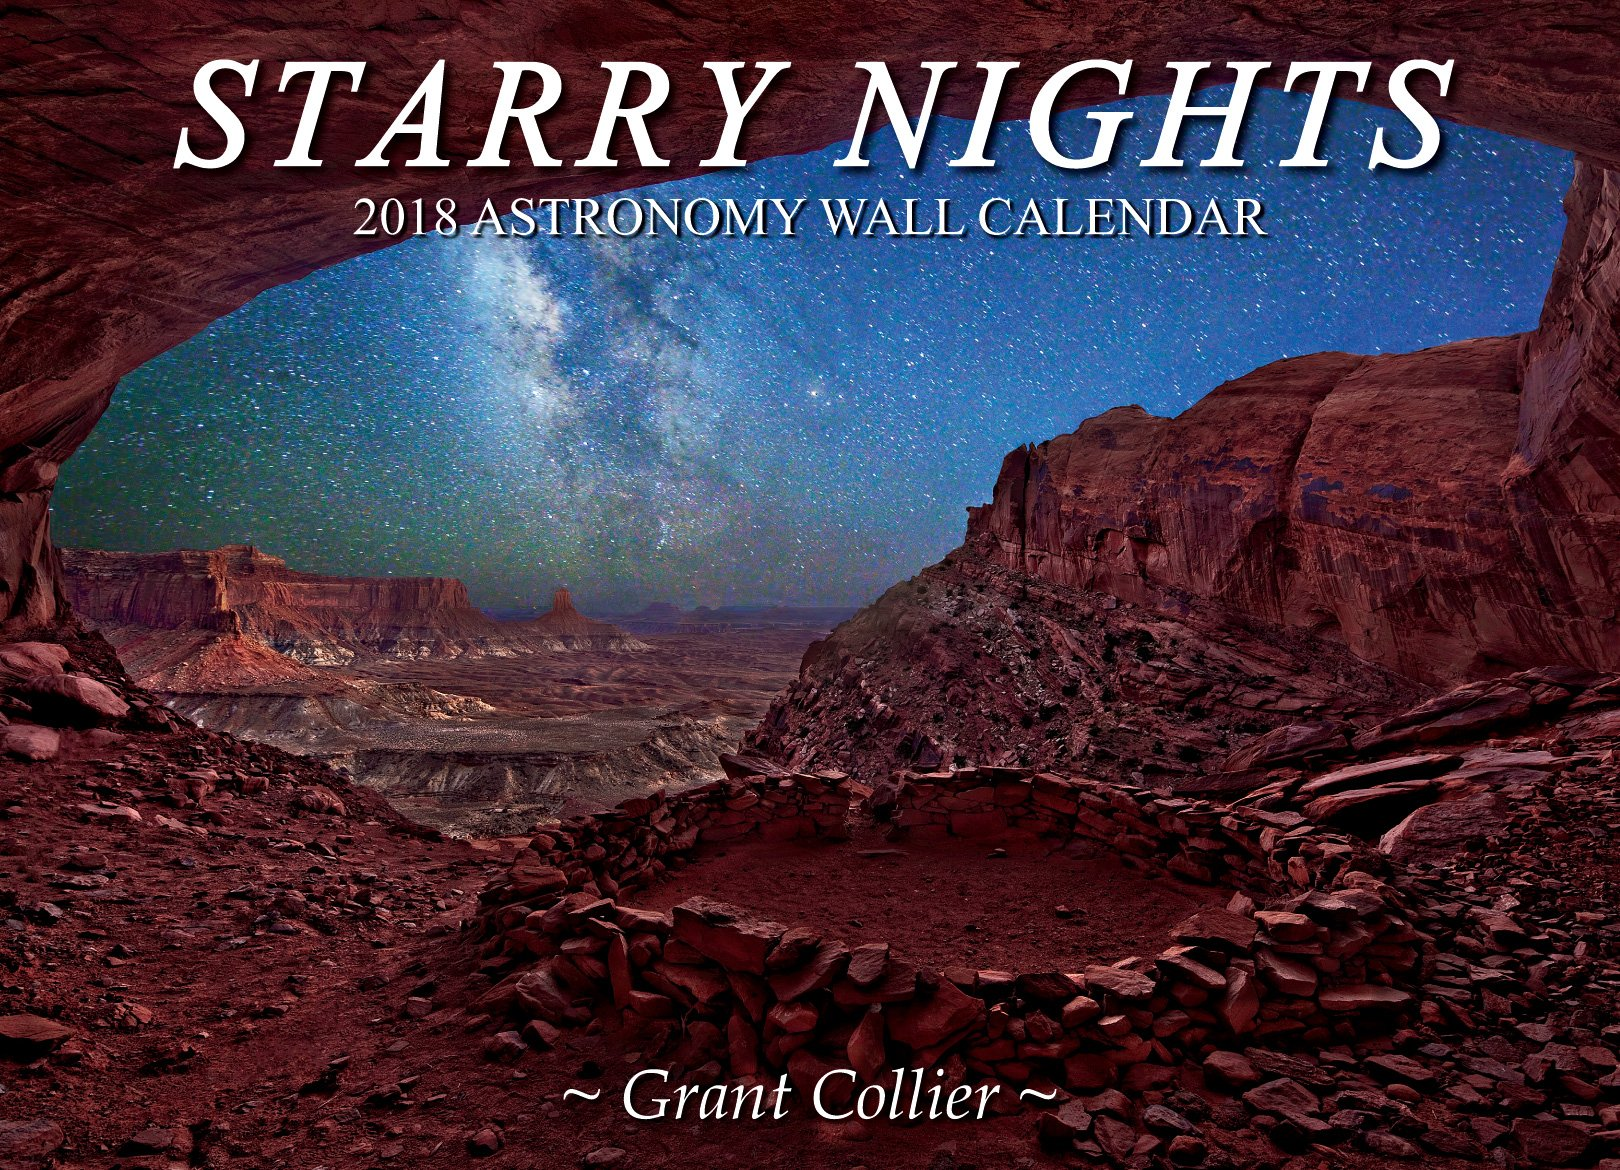 Starry Nights 2018 Astronomy Wall Calendar (13.5